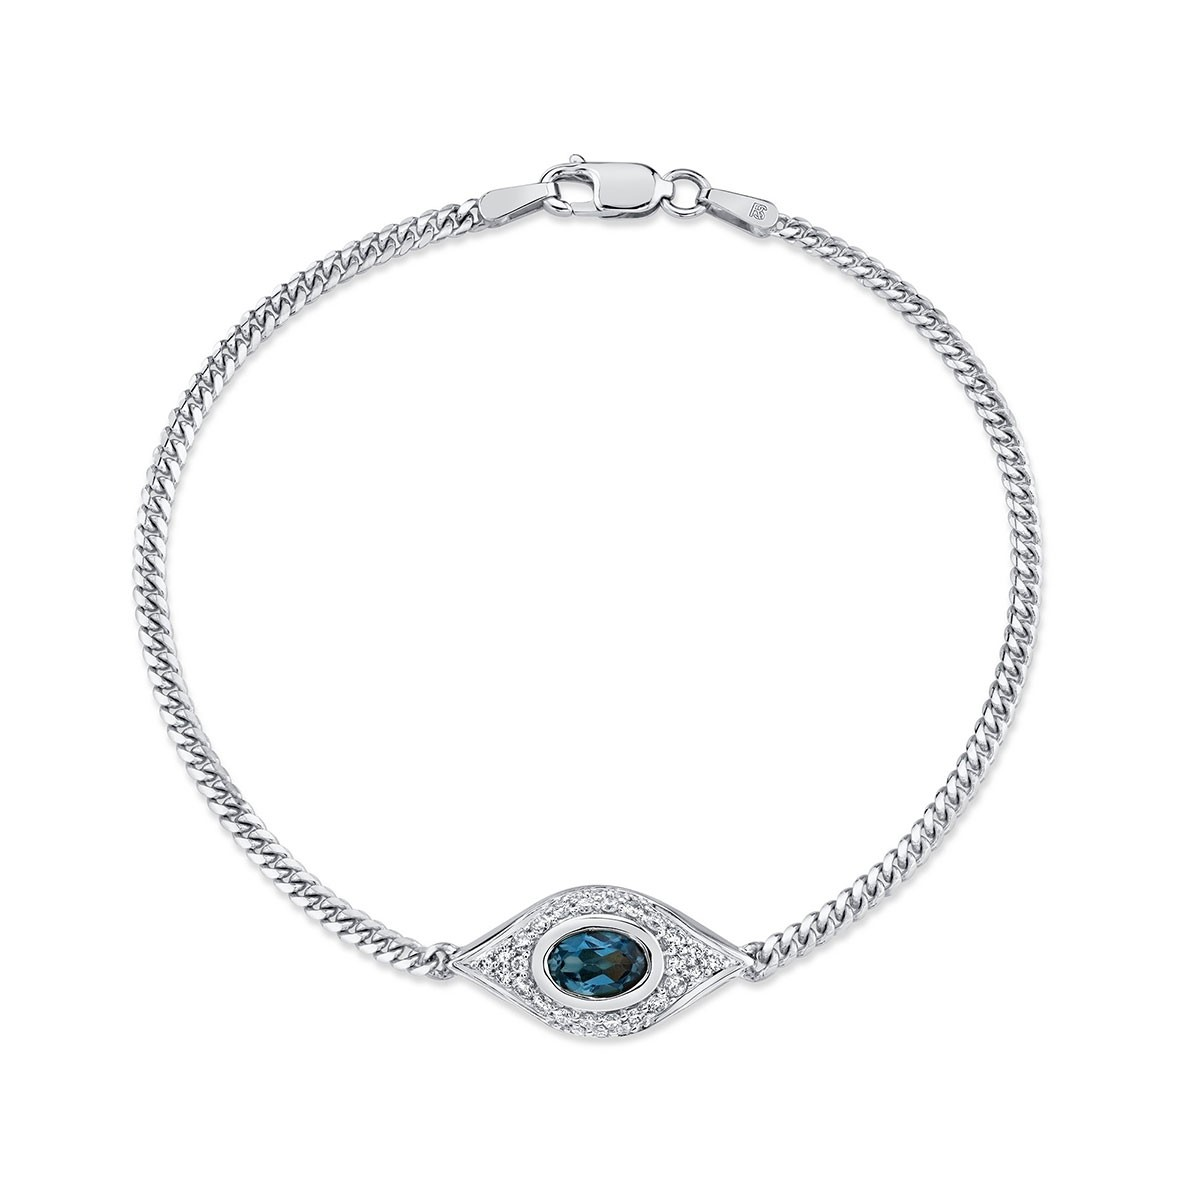 14k White Gold Diamond Oval Blue Topaz Evil Eye Bracelet